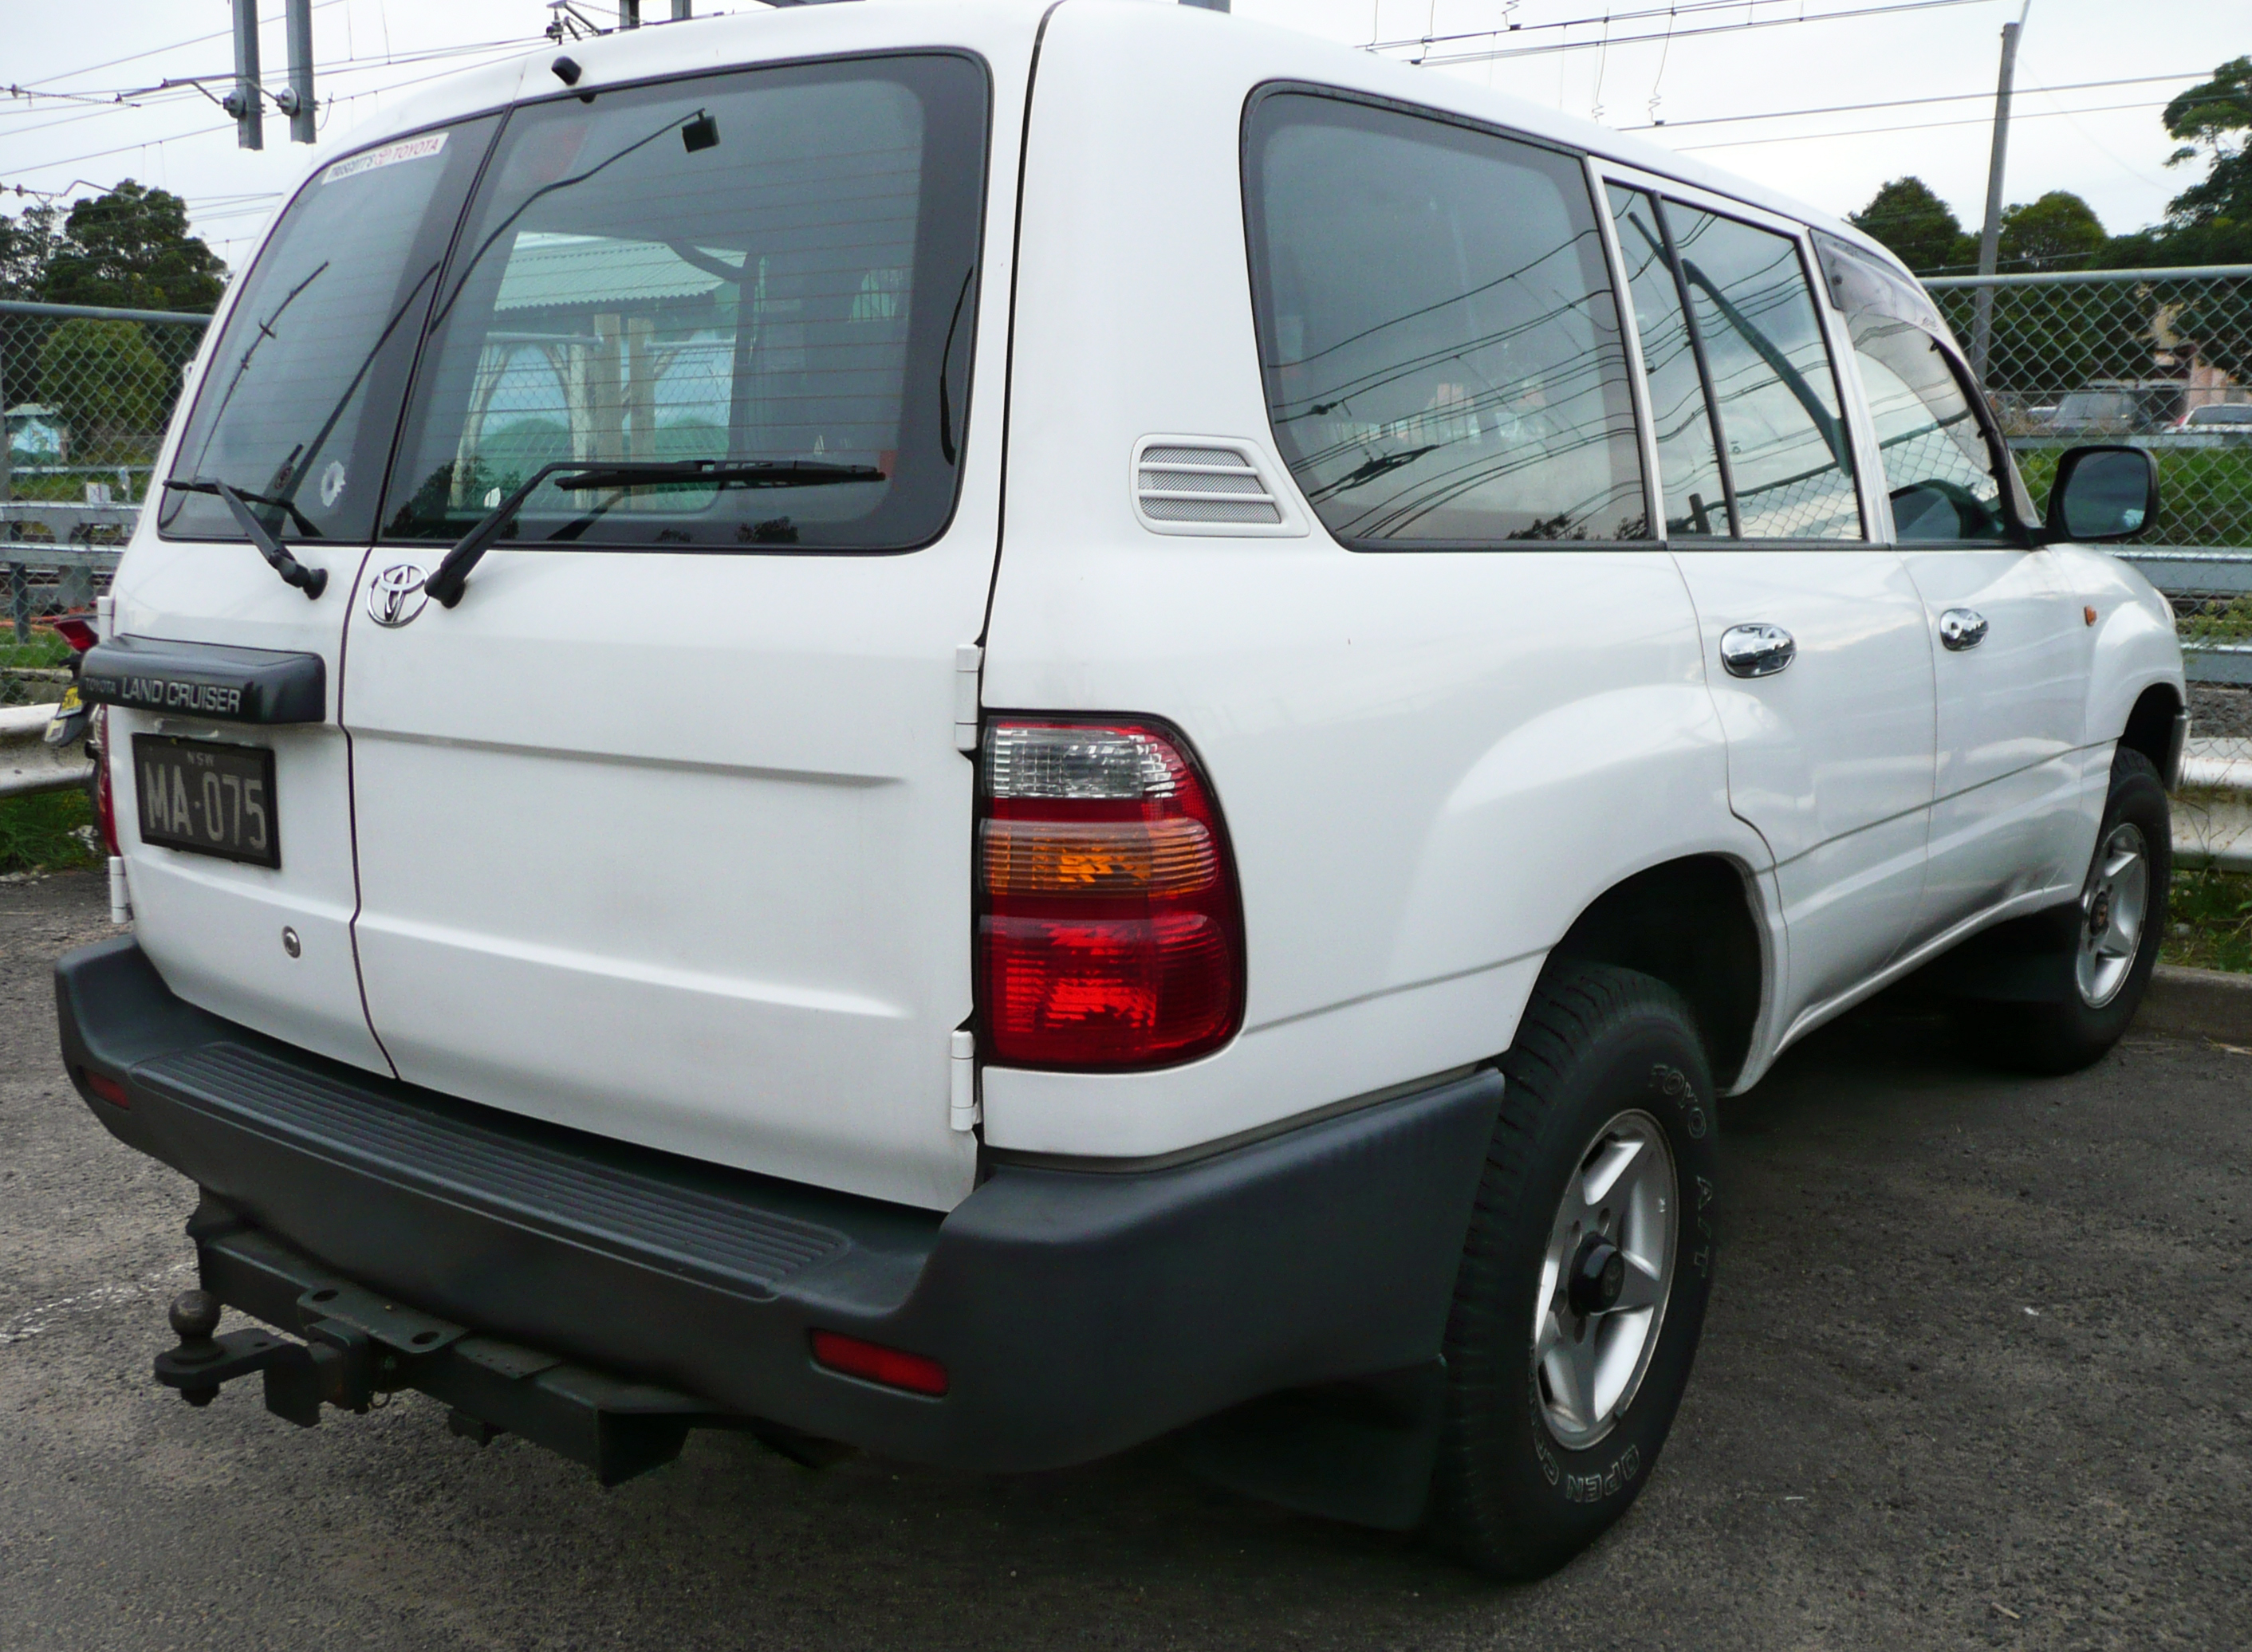 Toyota Land Cruiser Wiki >> File:1998-2002 Toyota Land Cruiser (HZJ105R) Standard 01.jpg - Wikimedia Commons